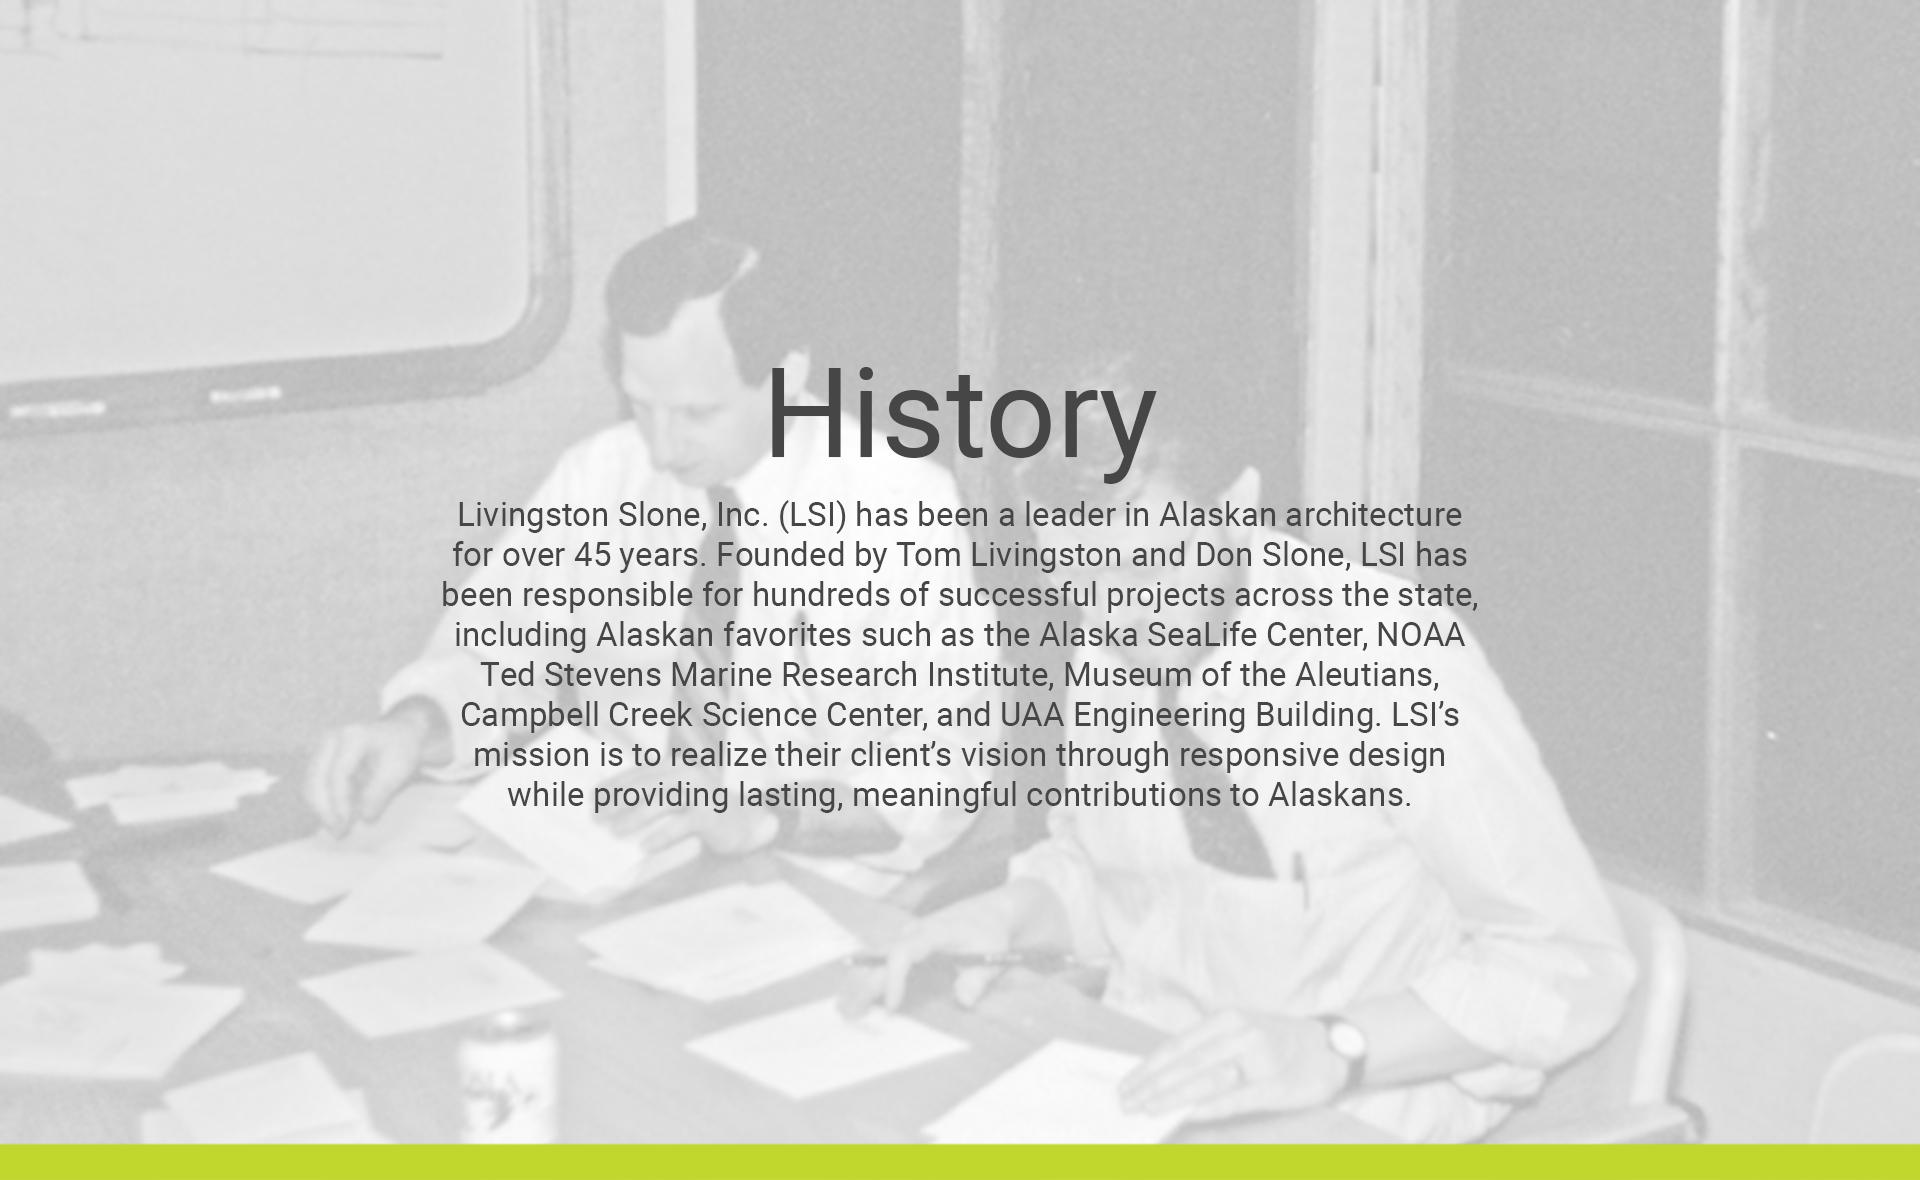 LSS - History B&W - After - 1920 x 1180